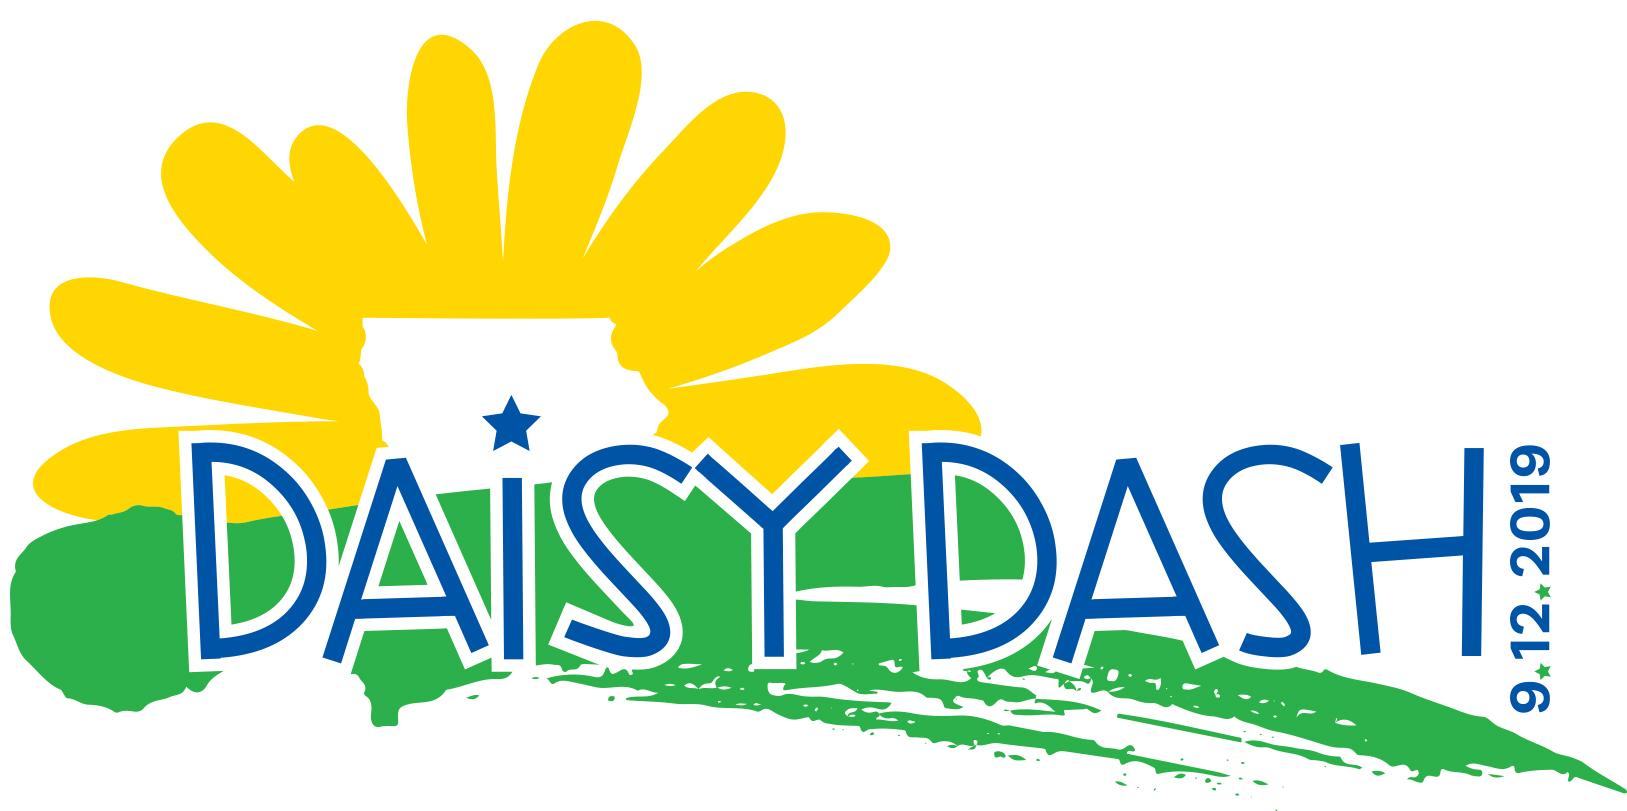 Daisy Dash Logo